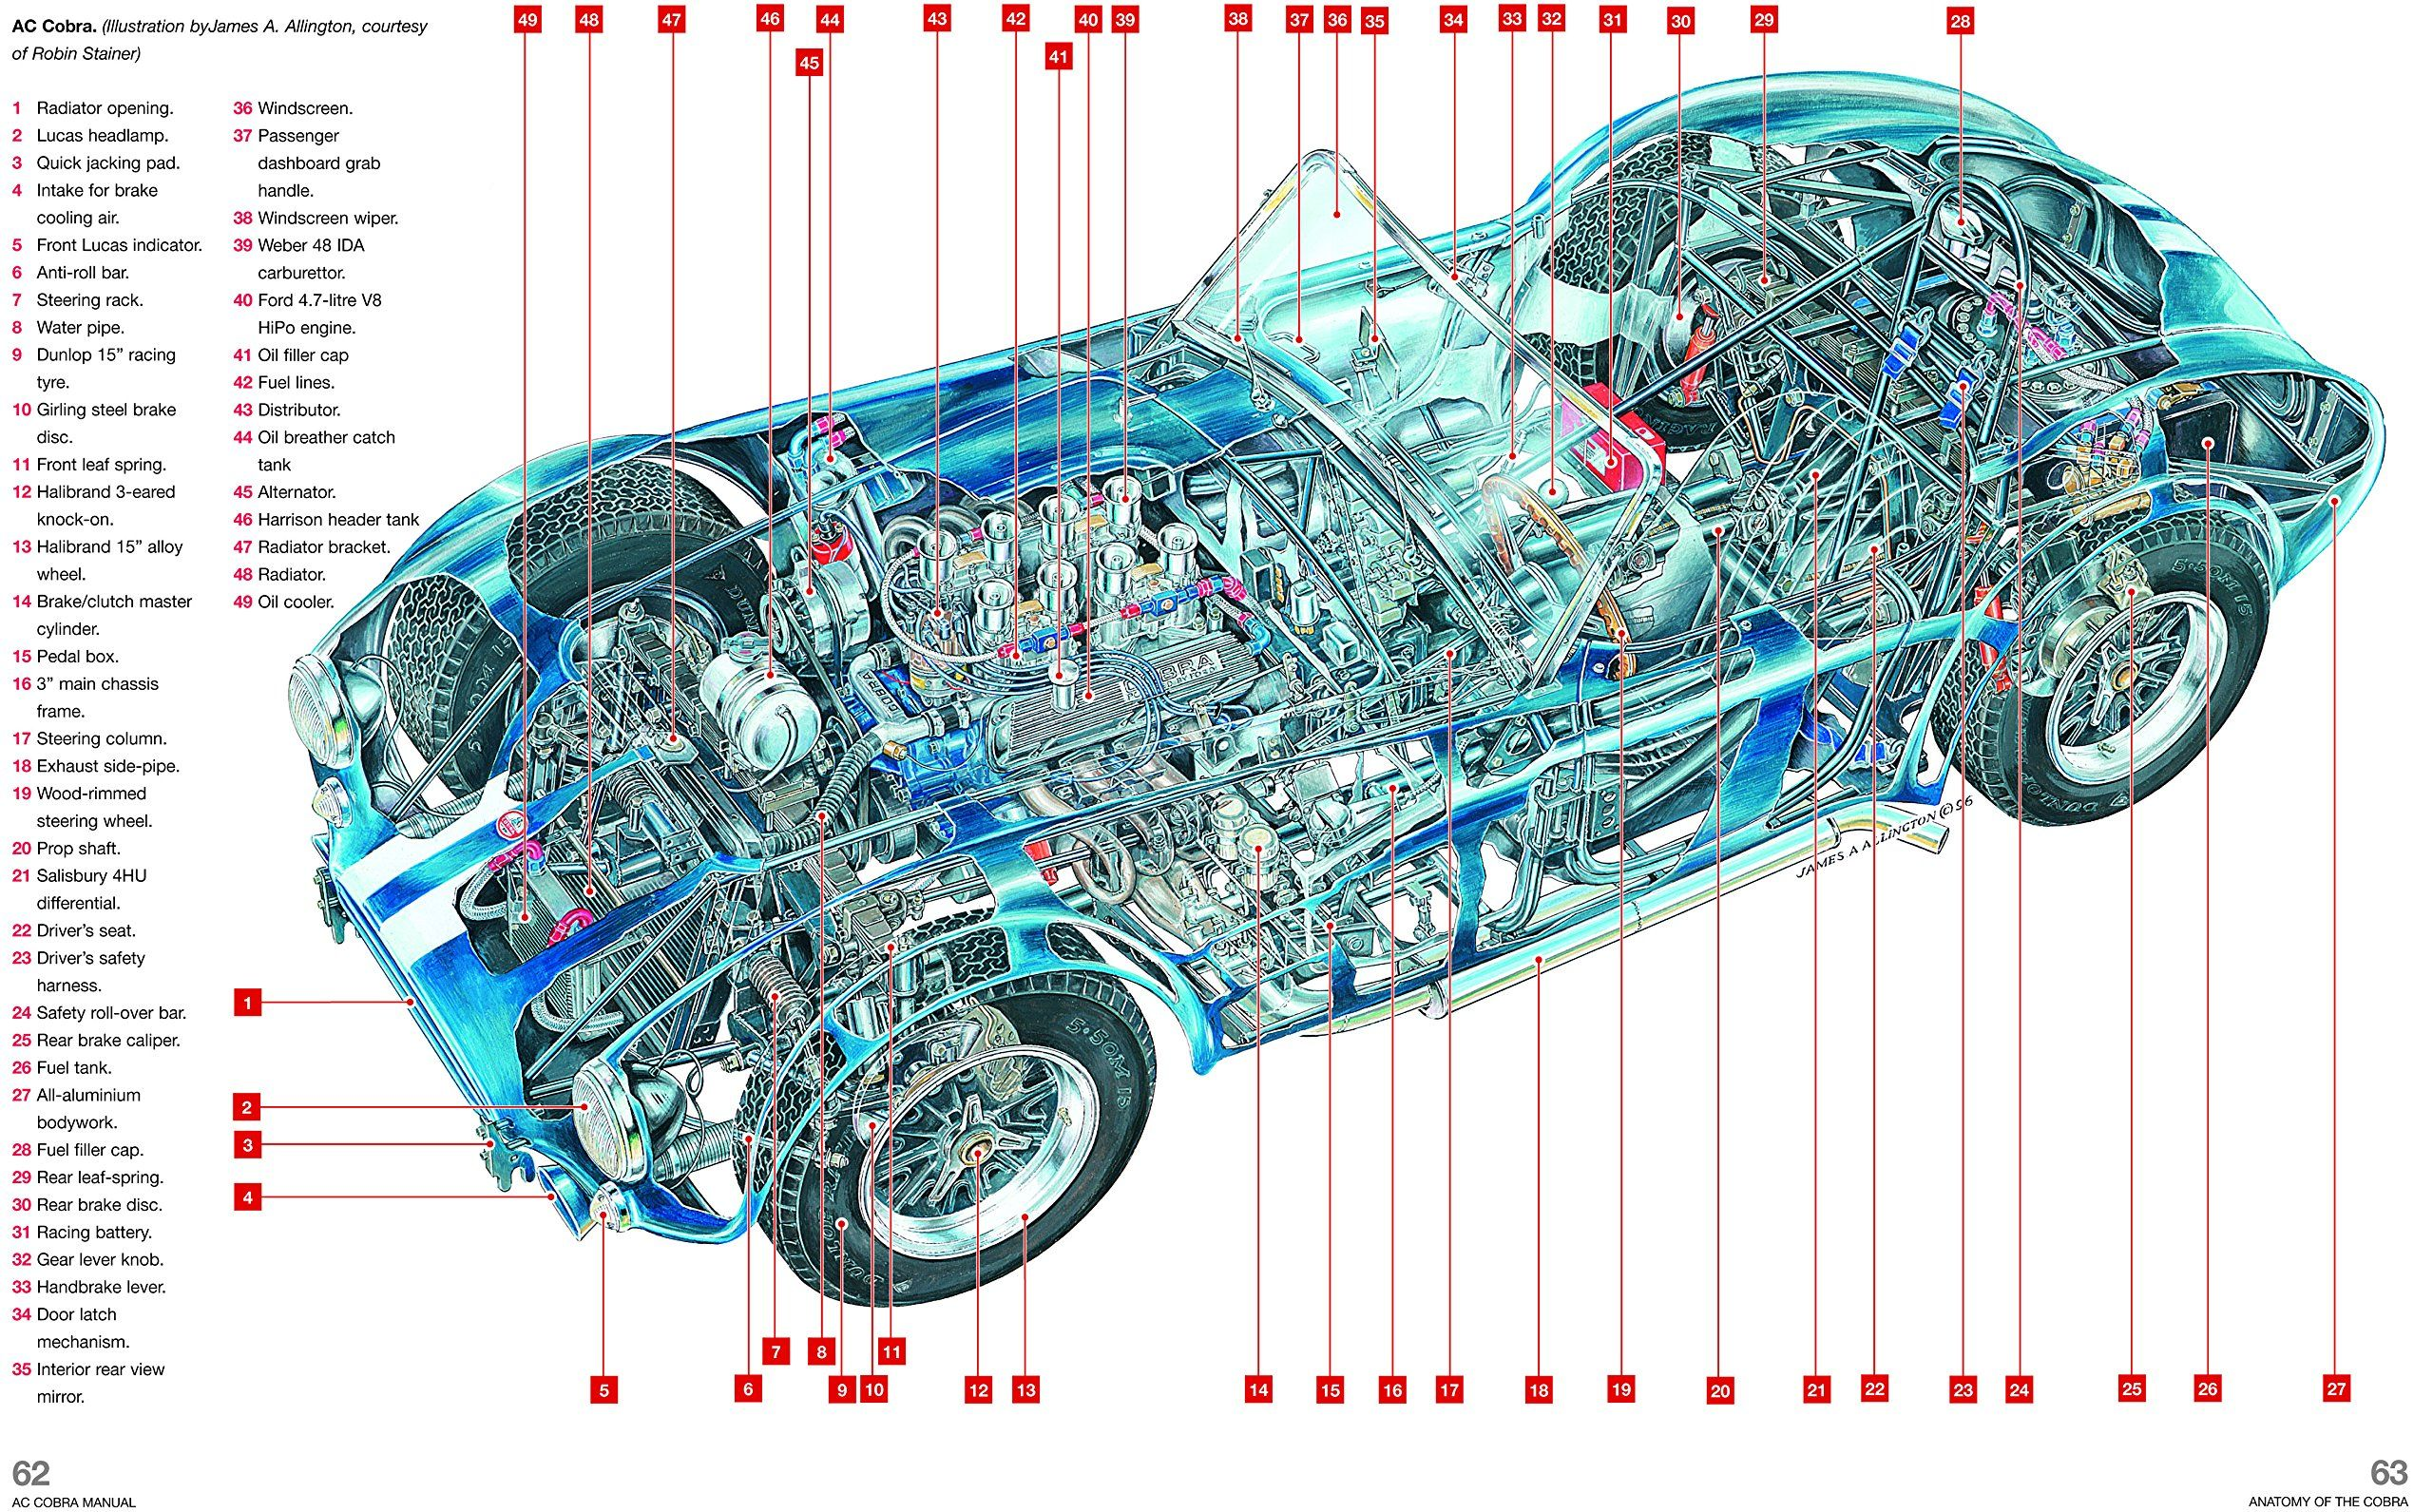 Ac cobra kit car wiring diagram diy wiring diagrams image result for ac cobra dimensions shelby pinterest ac cobra rh pinterest com 2007 honda accord wiring diagram ac electrical wiring diagrams cheapraybanclubmaster Images